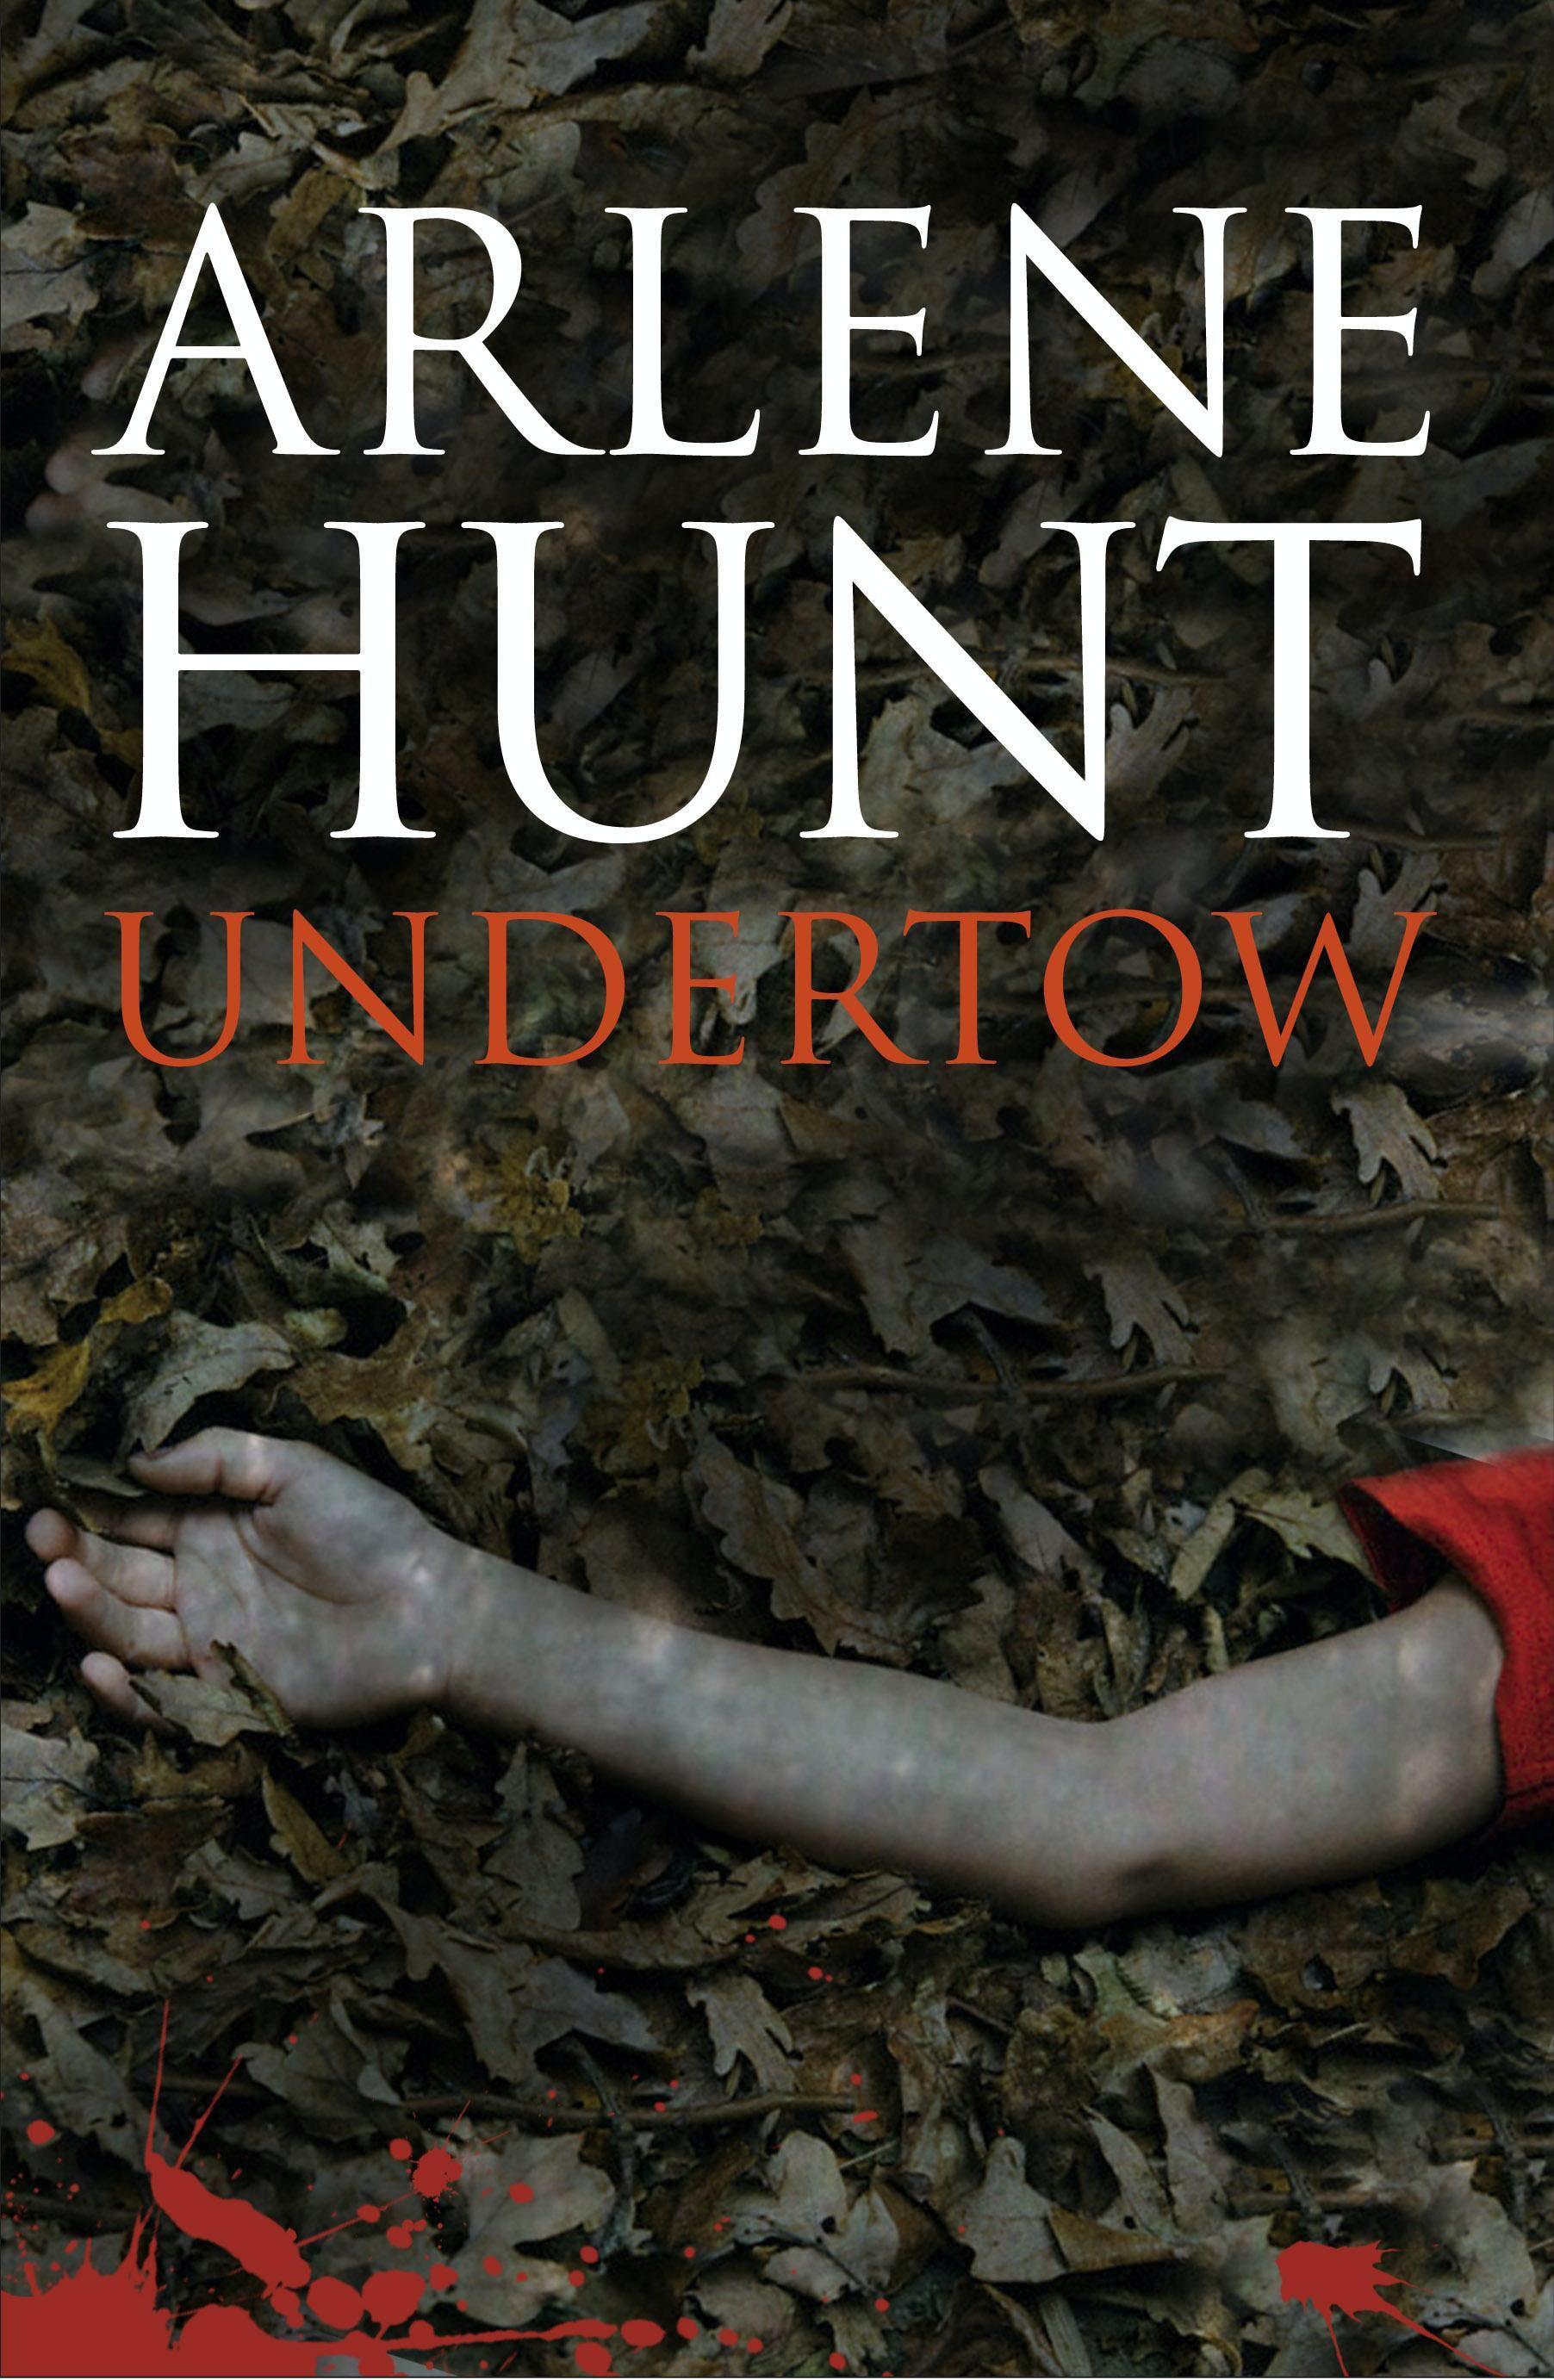 Undertow by Arlene Hunt - Books - Hachette Australia